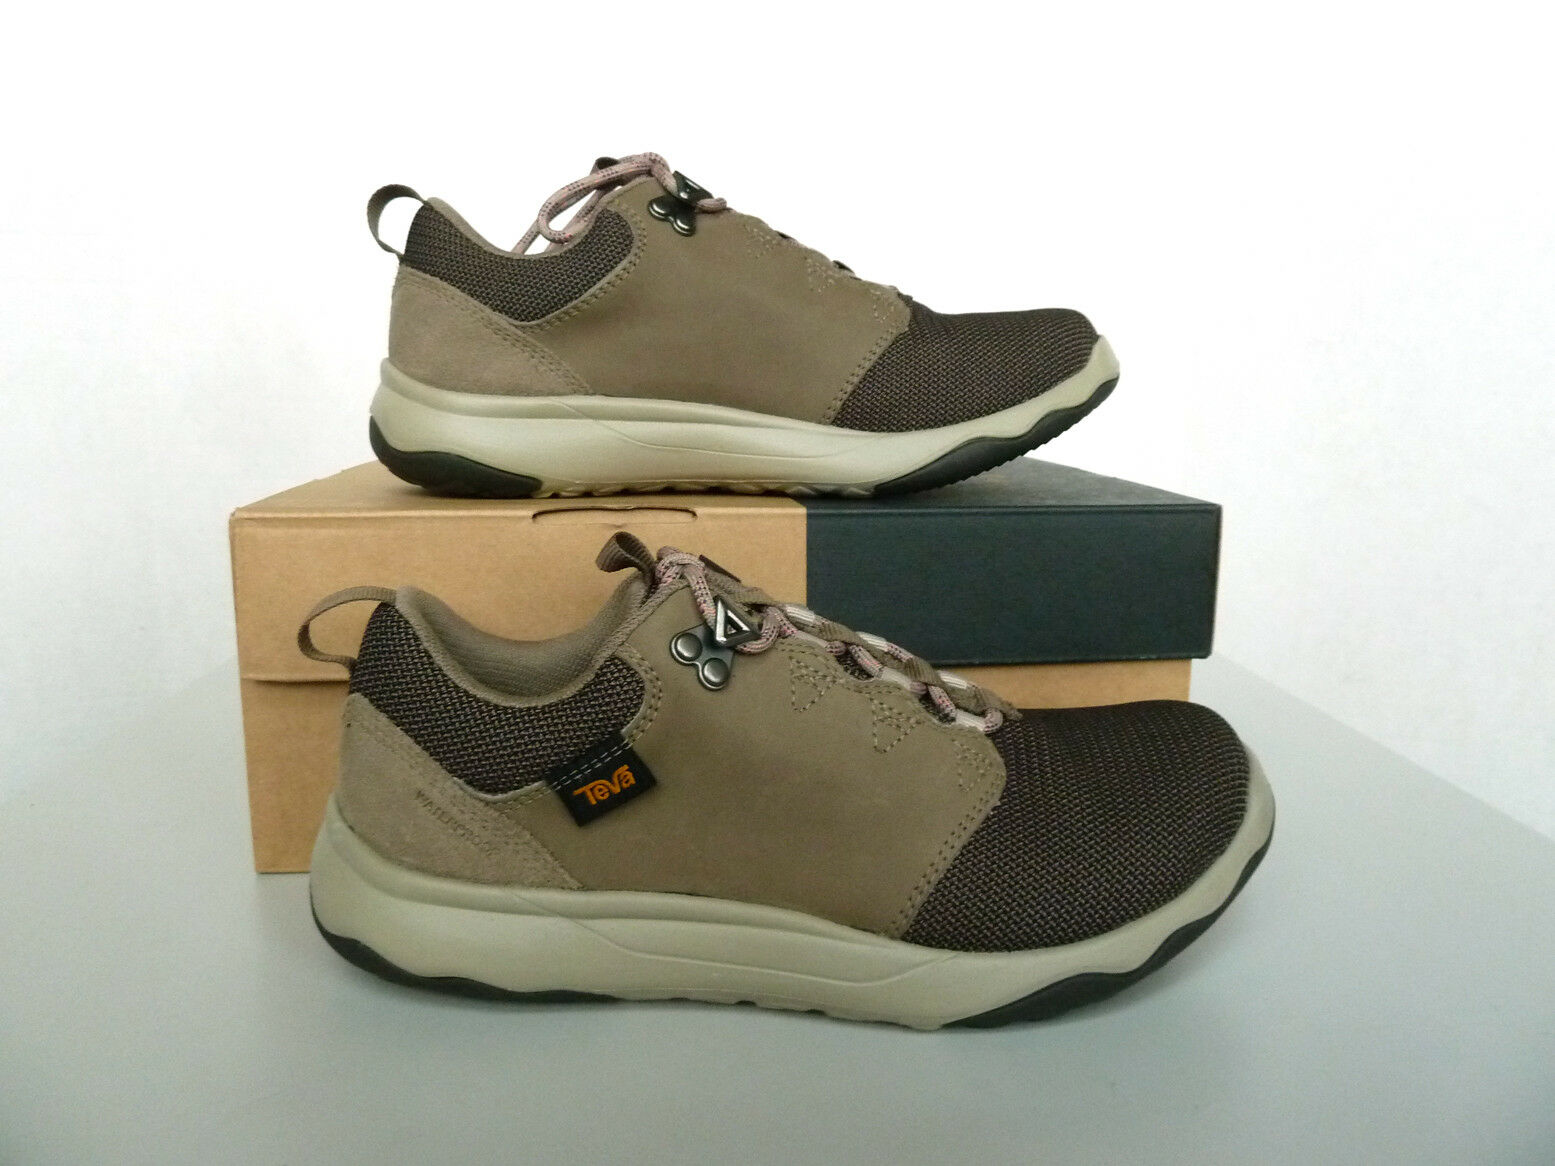 New donna`s Teva Arrowood WP Hiking scarpe scarpe scarpe 1012450 MSRP 120 aa9784